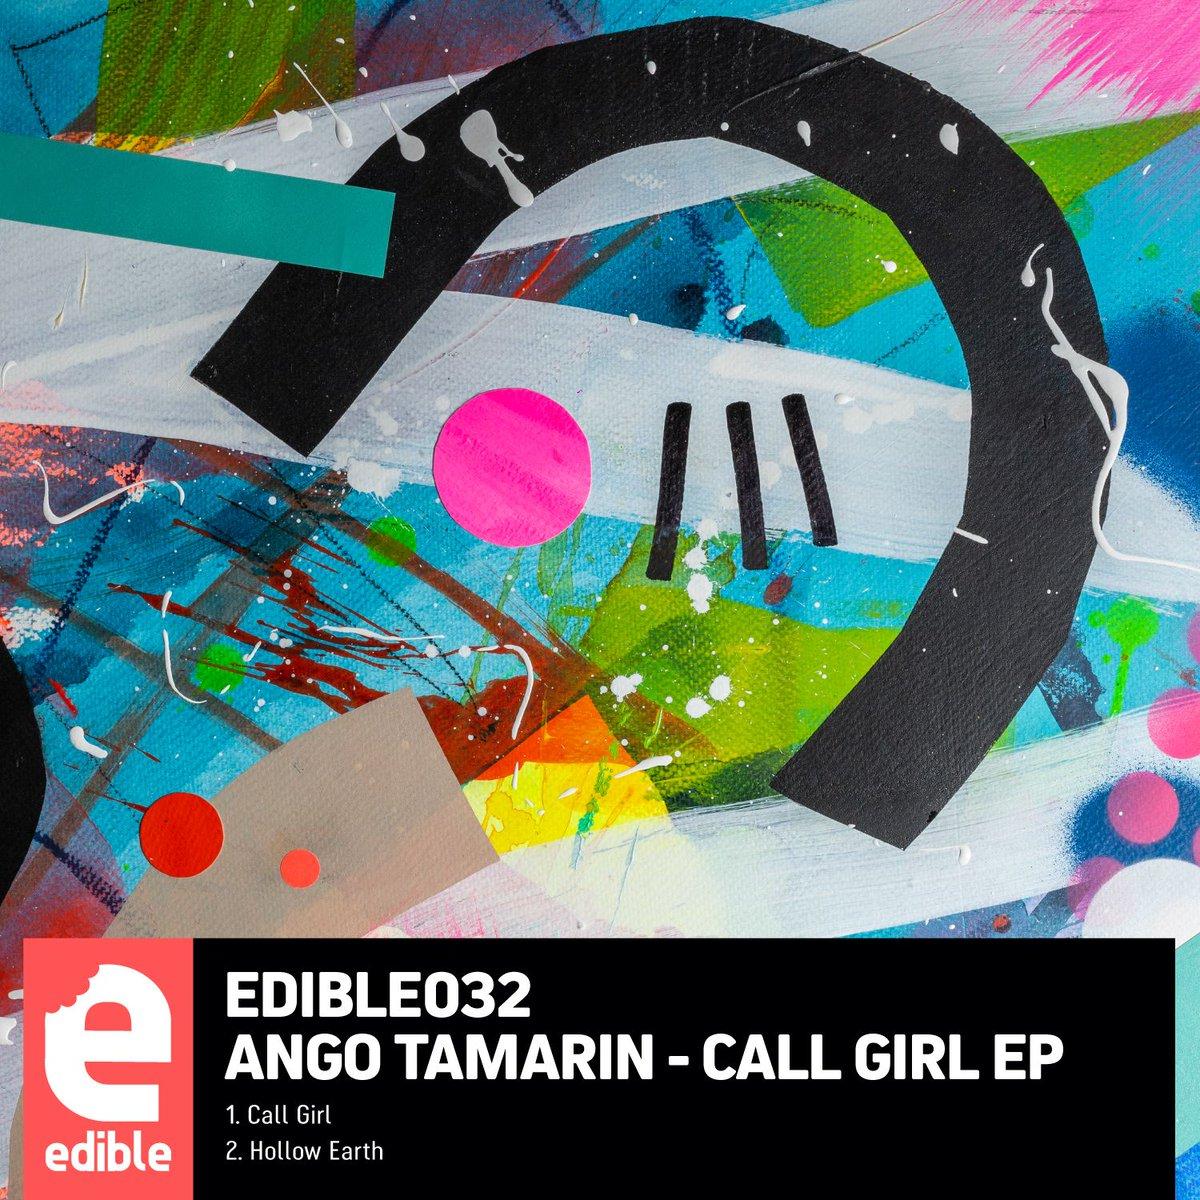 listen to @sarahstorytweet play the new Ango tamarin single on @EdibleRecords on her @R1Dance show buff.ly/3vl6kqf